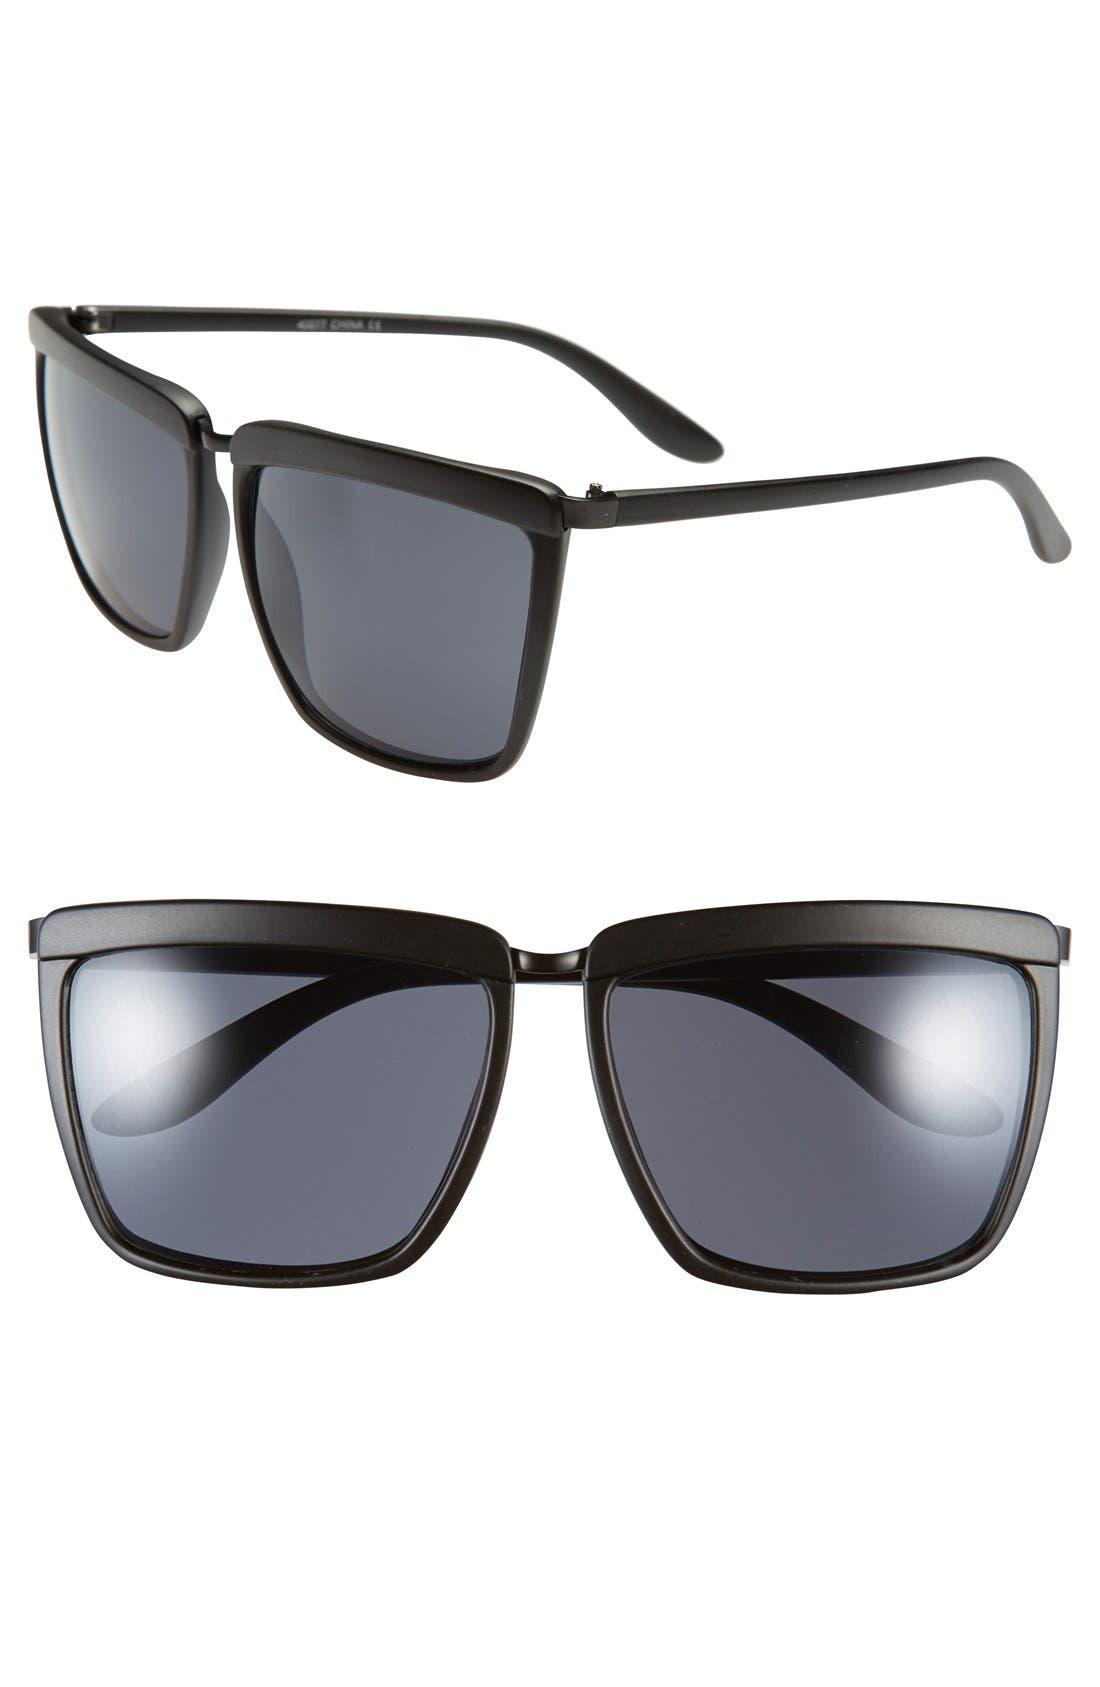 Alternate Image 1 Selected - A.J. Morgan 'Shady' 60mm Sunglasses